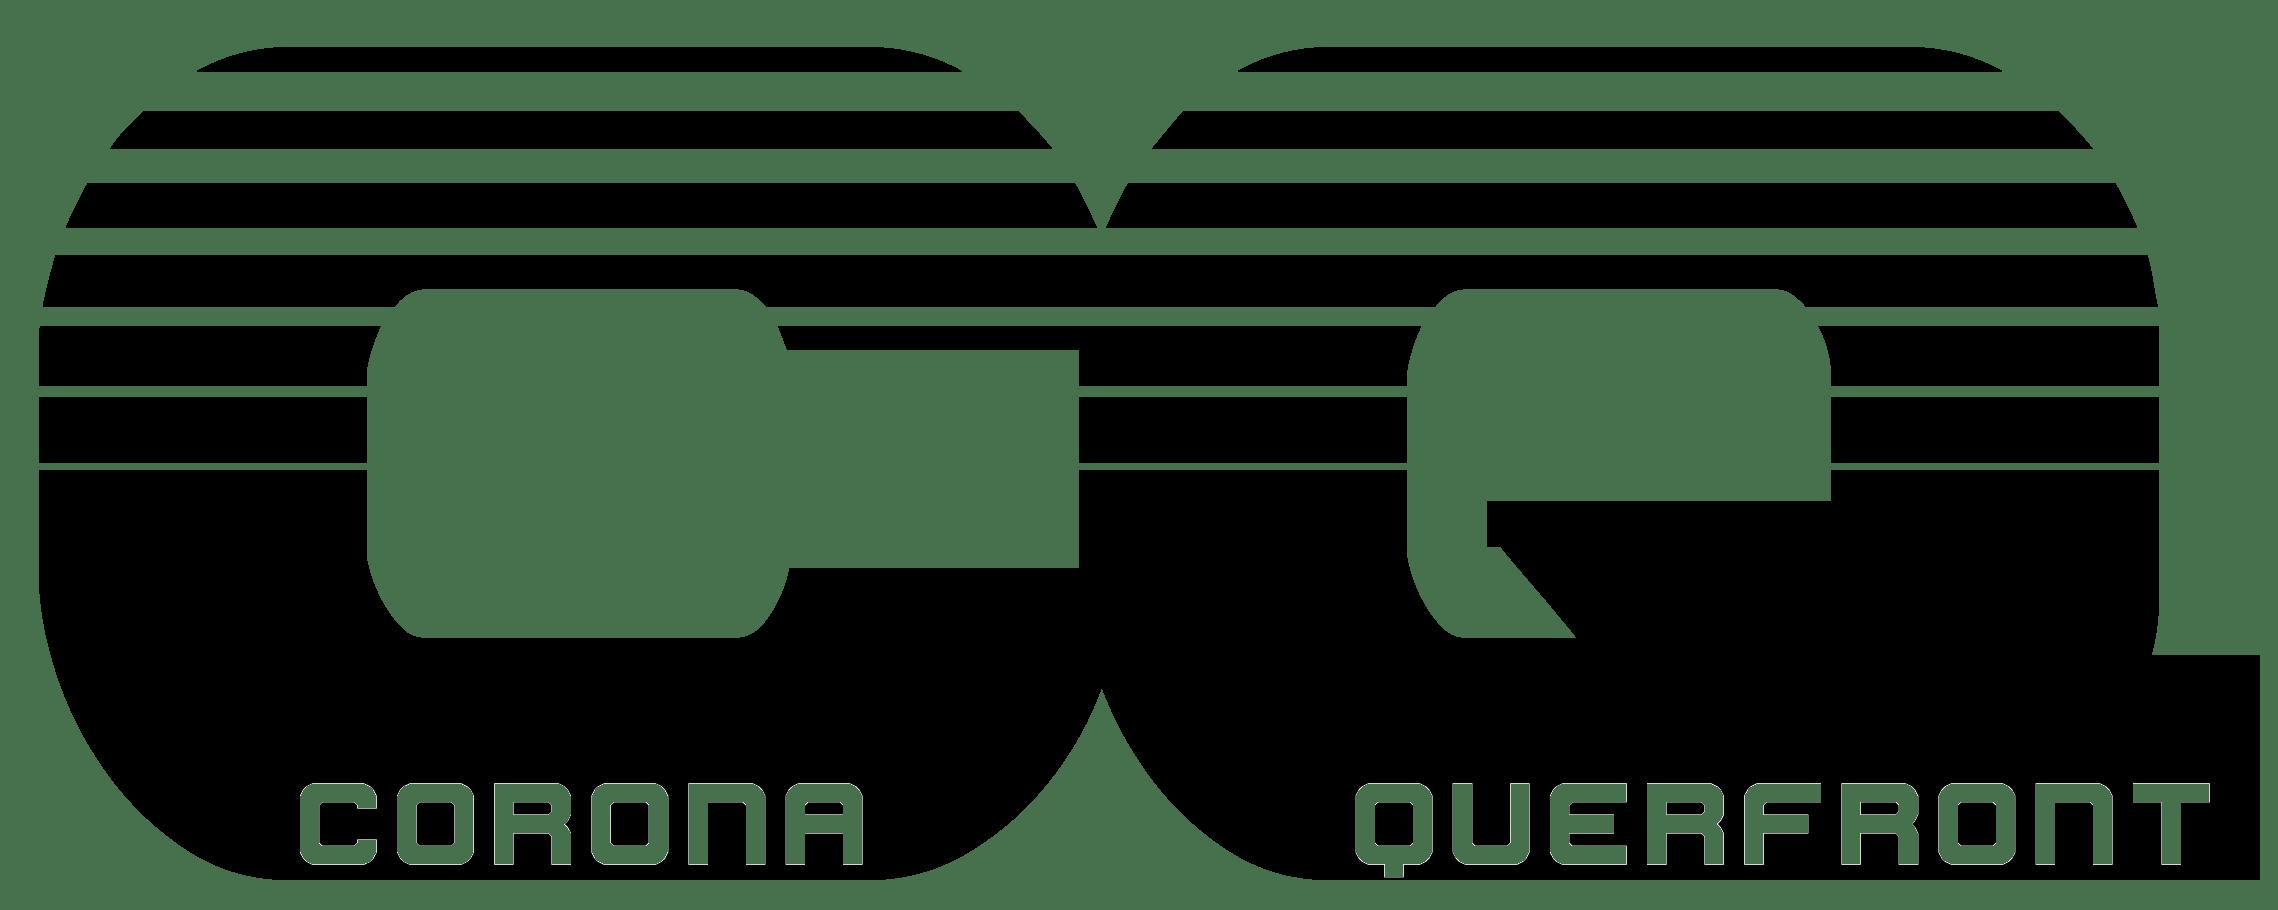 Corona-Querfront